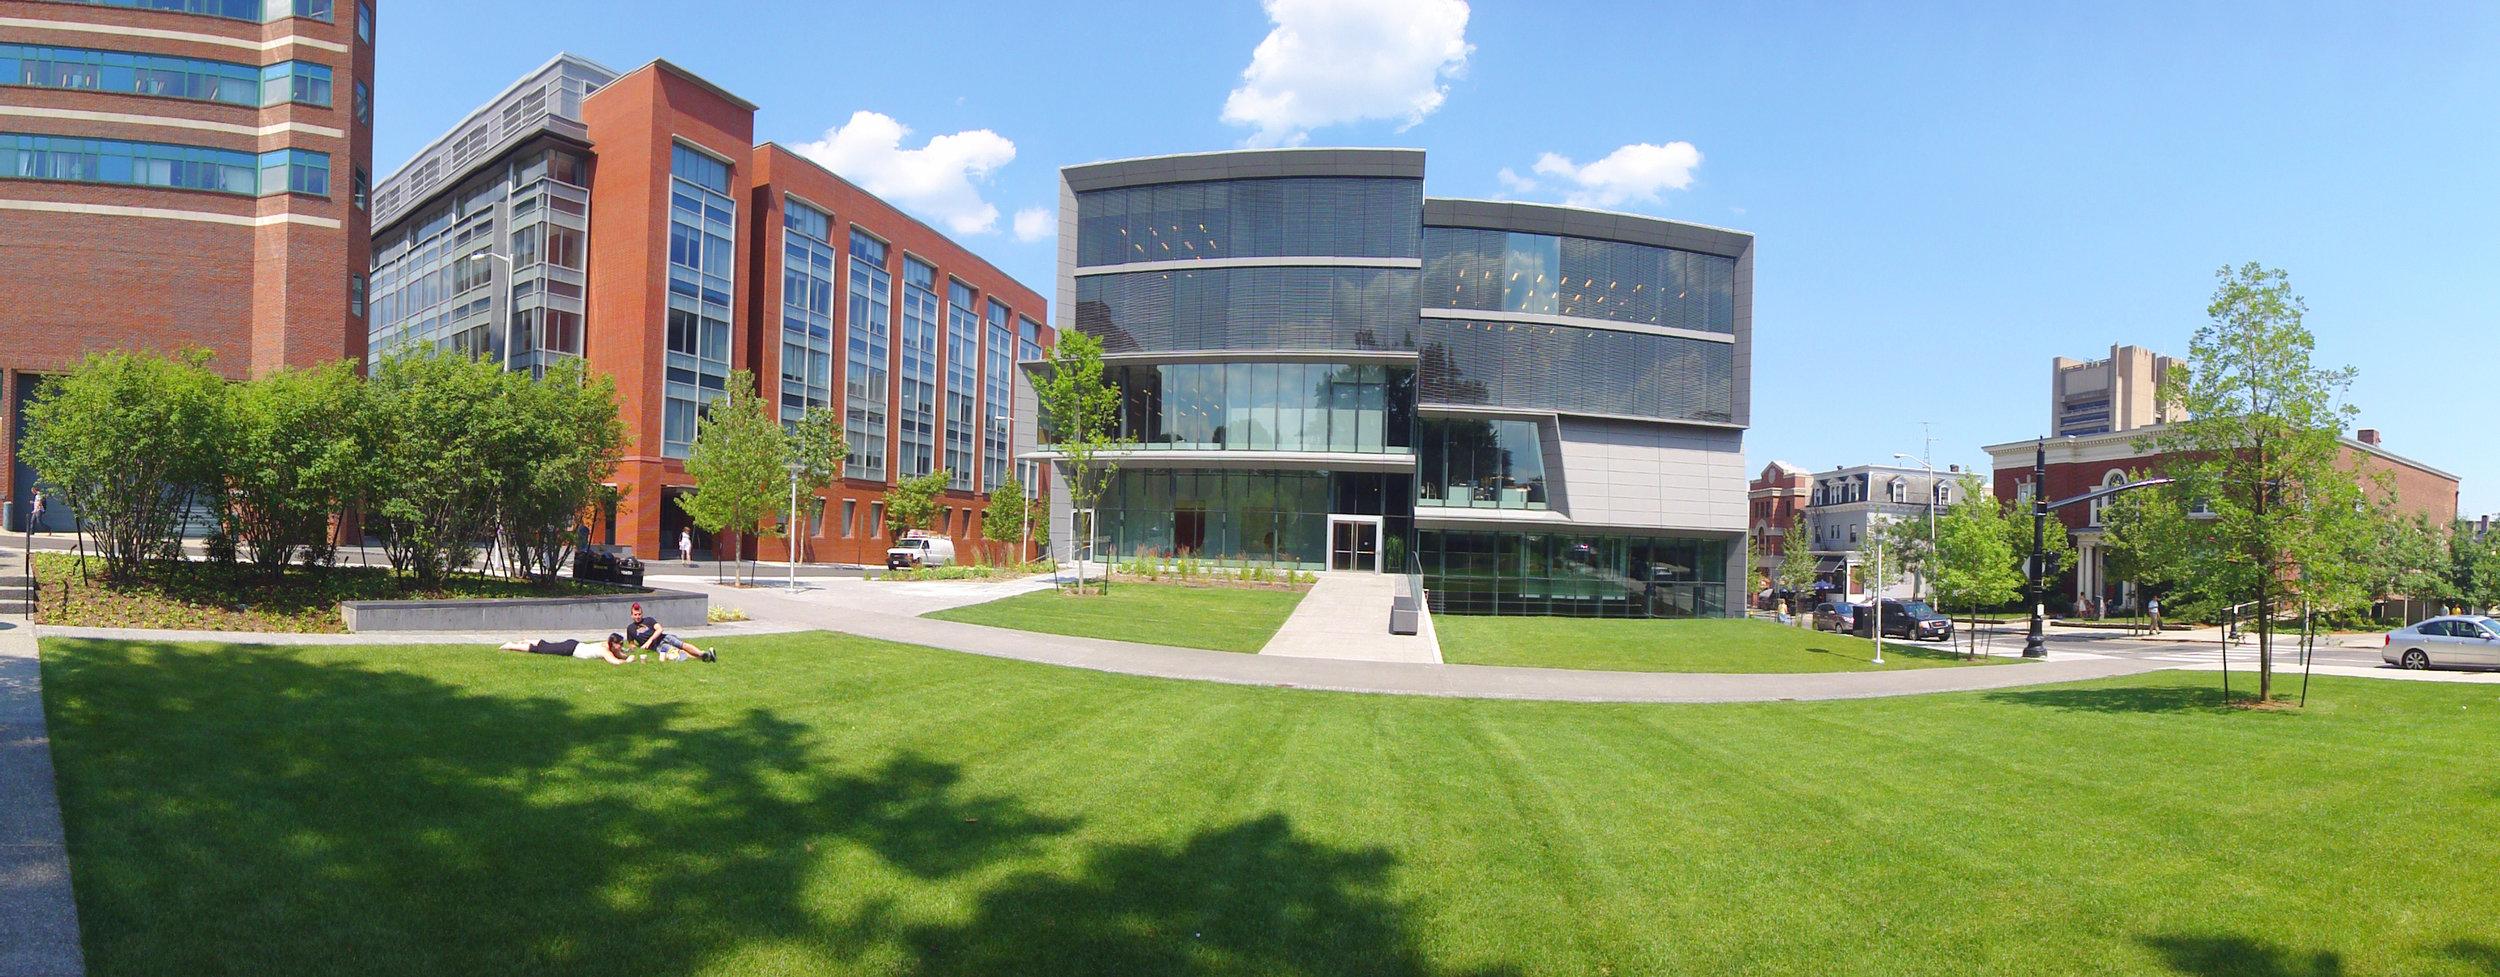 brown creative arts center